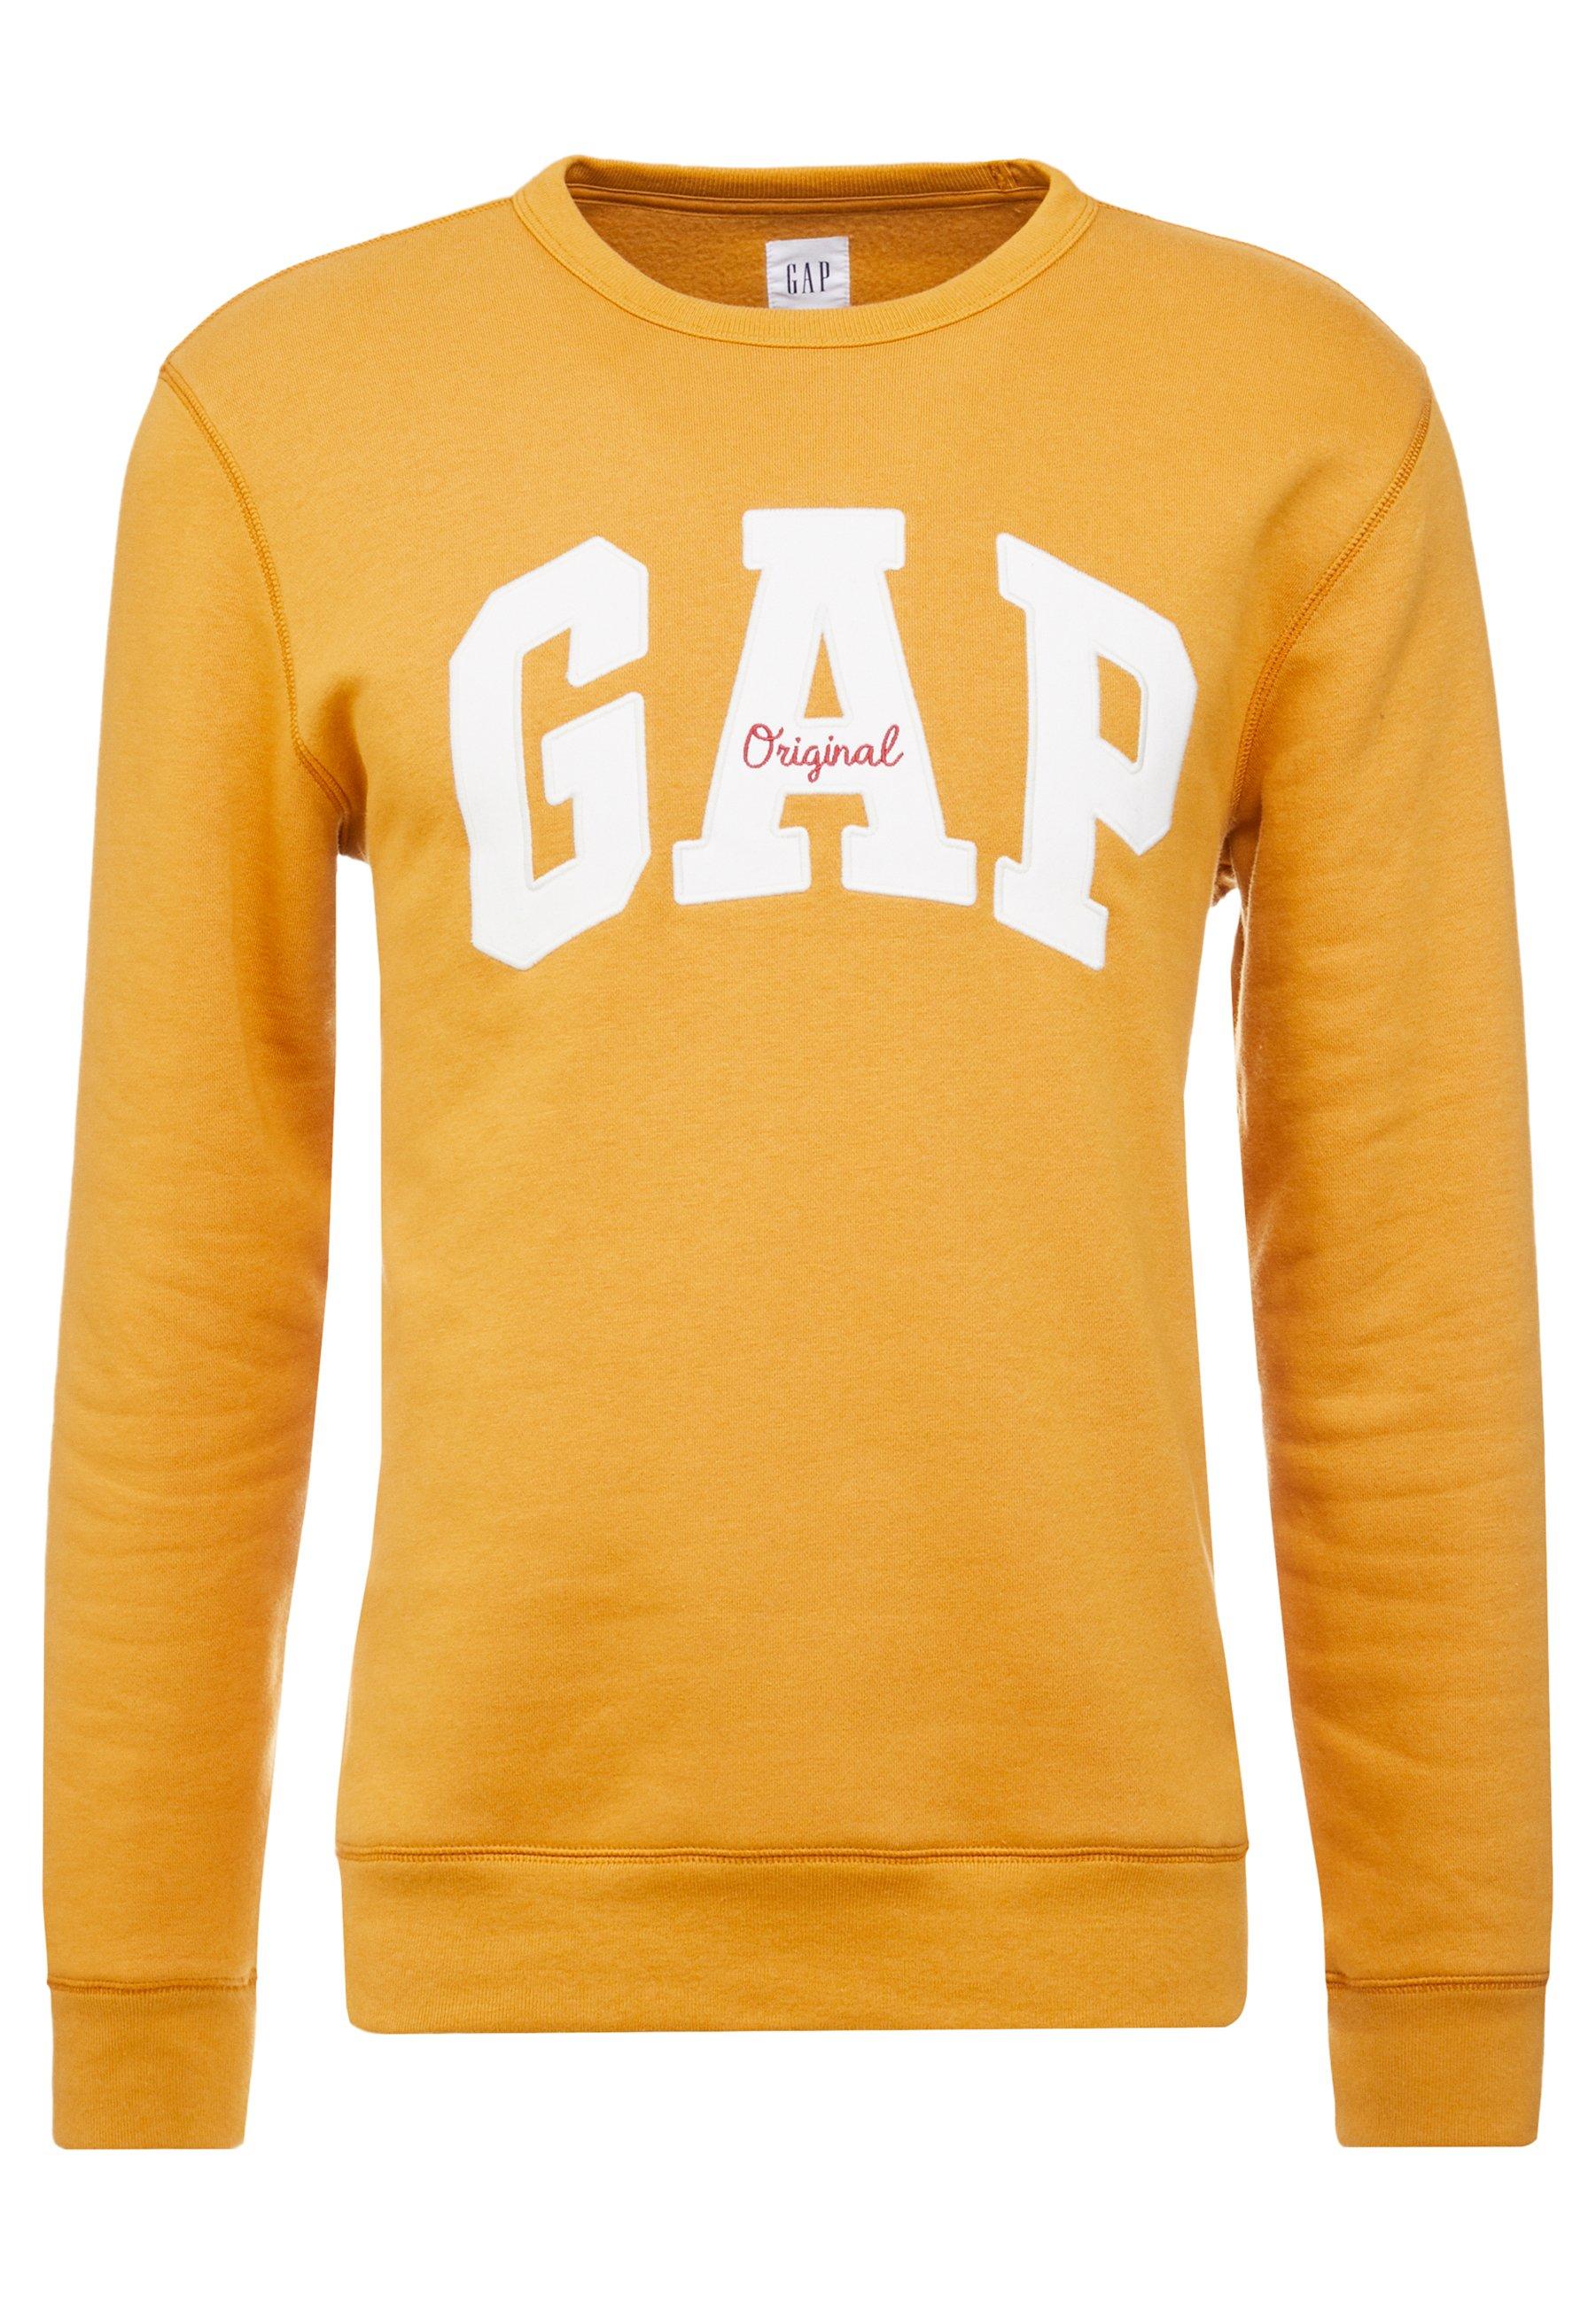 GAP ORIGINAL ARCH CREW Sweater tapestry navy Zalando.nl